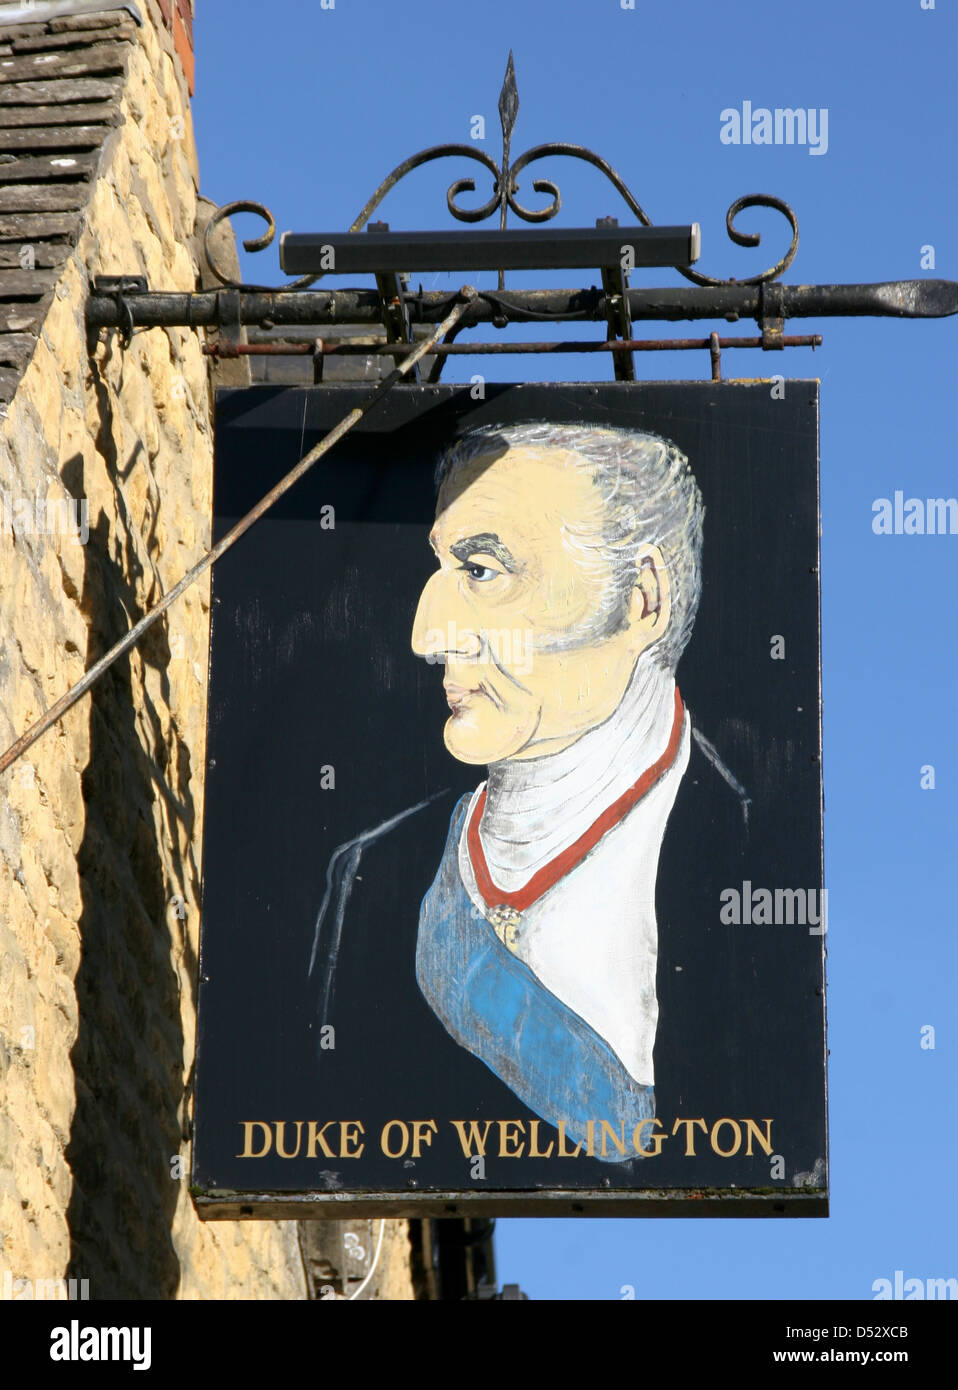 Duke of Wellington inn sign Bourton on the Water Gloucestershire England U - Stock Image